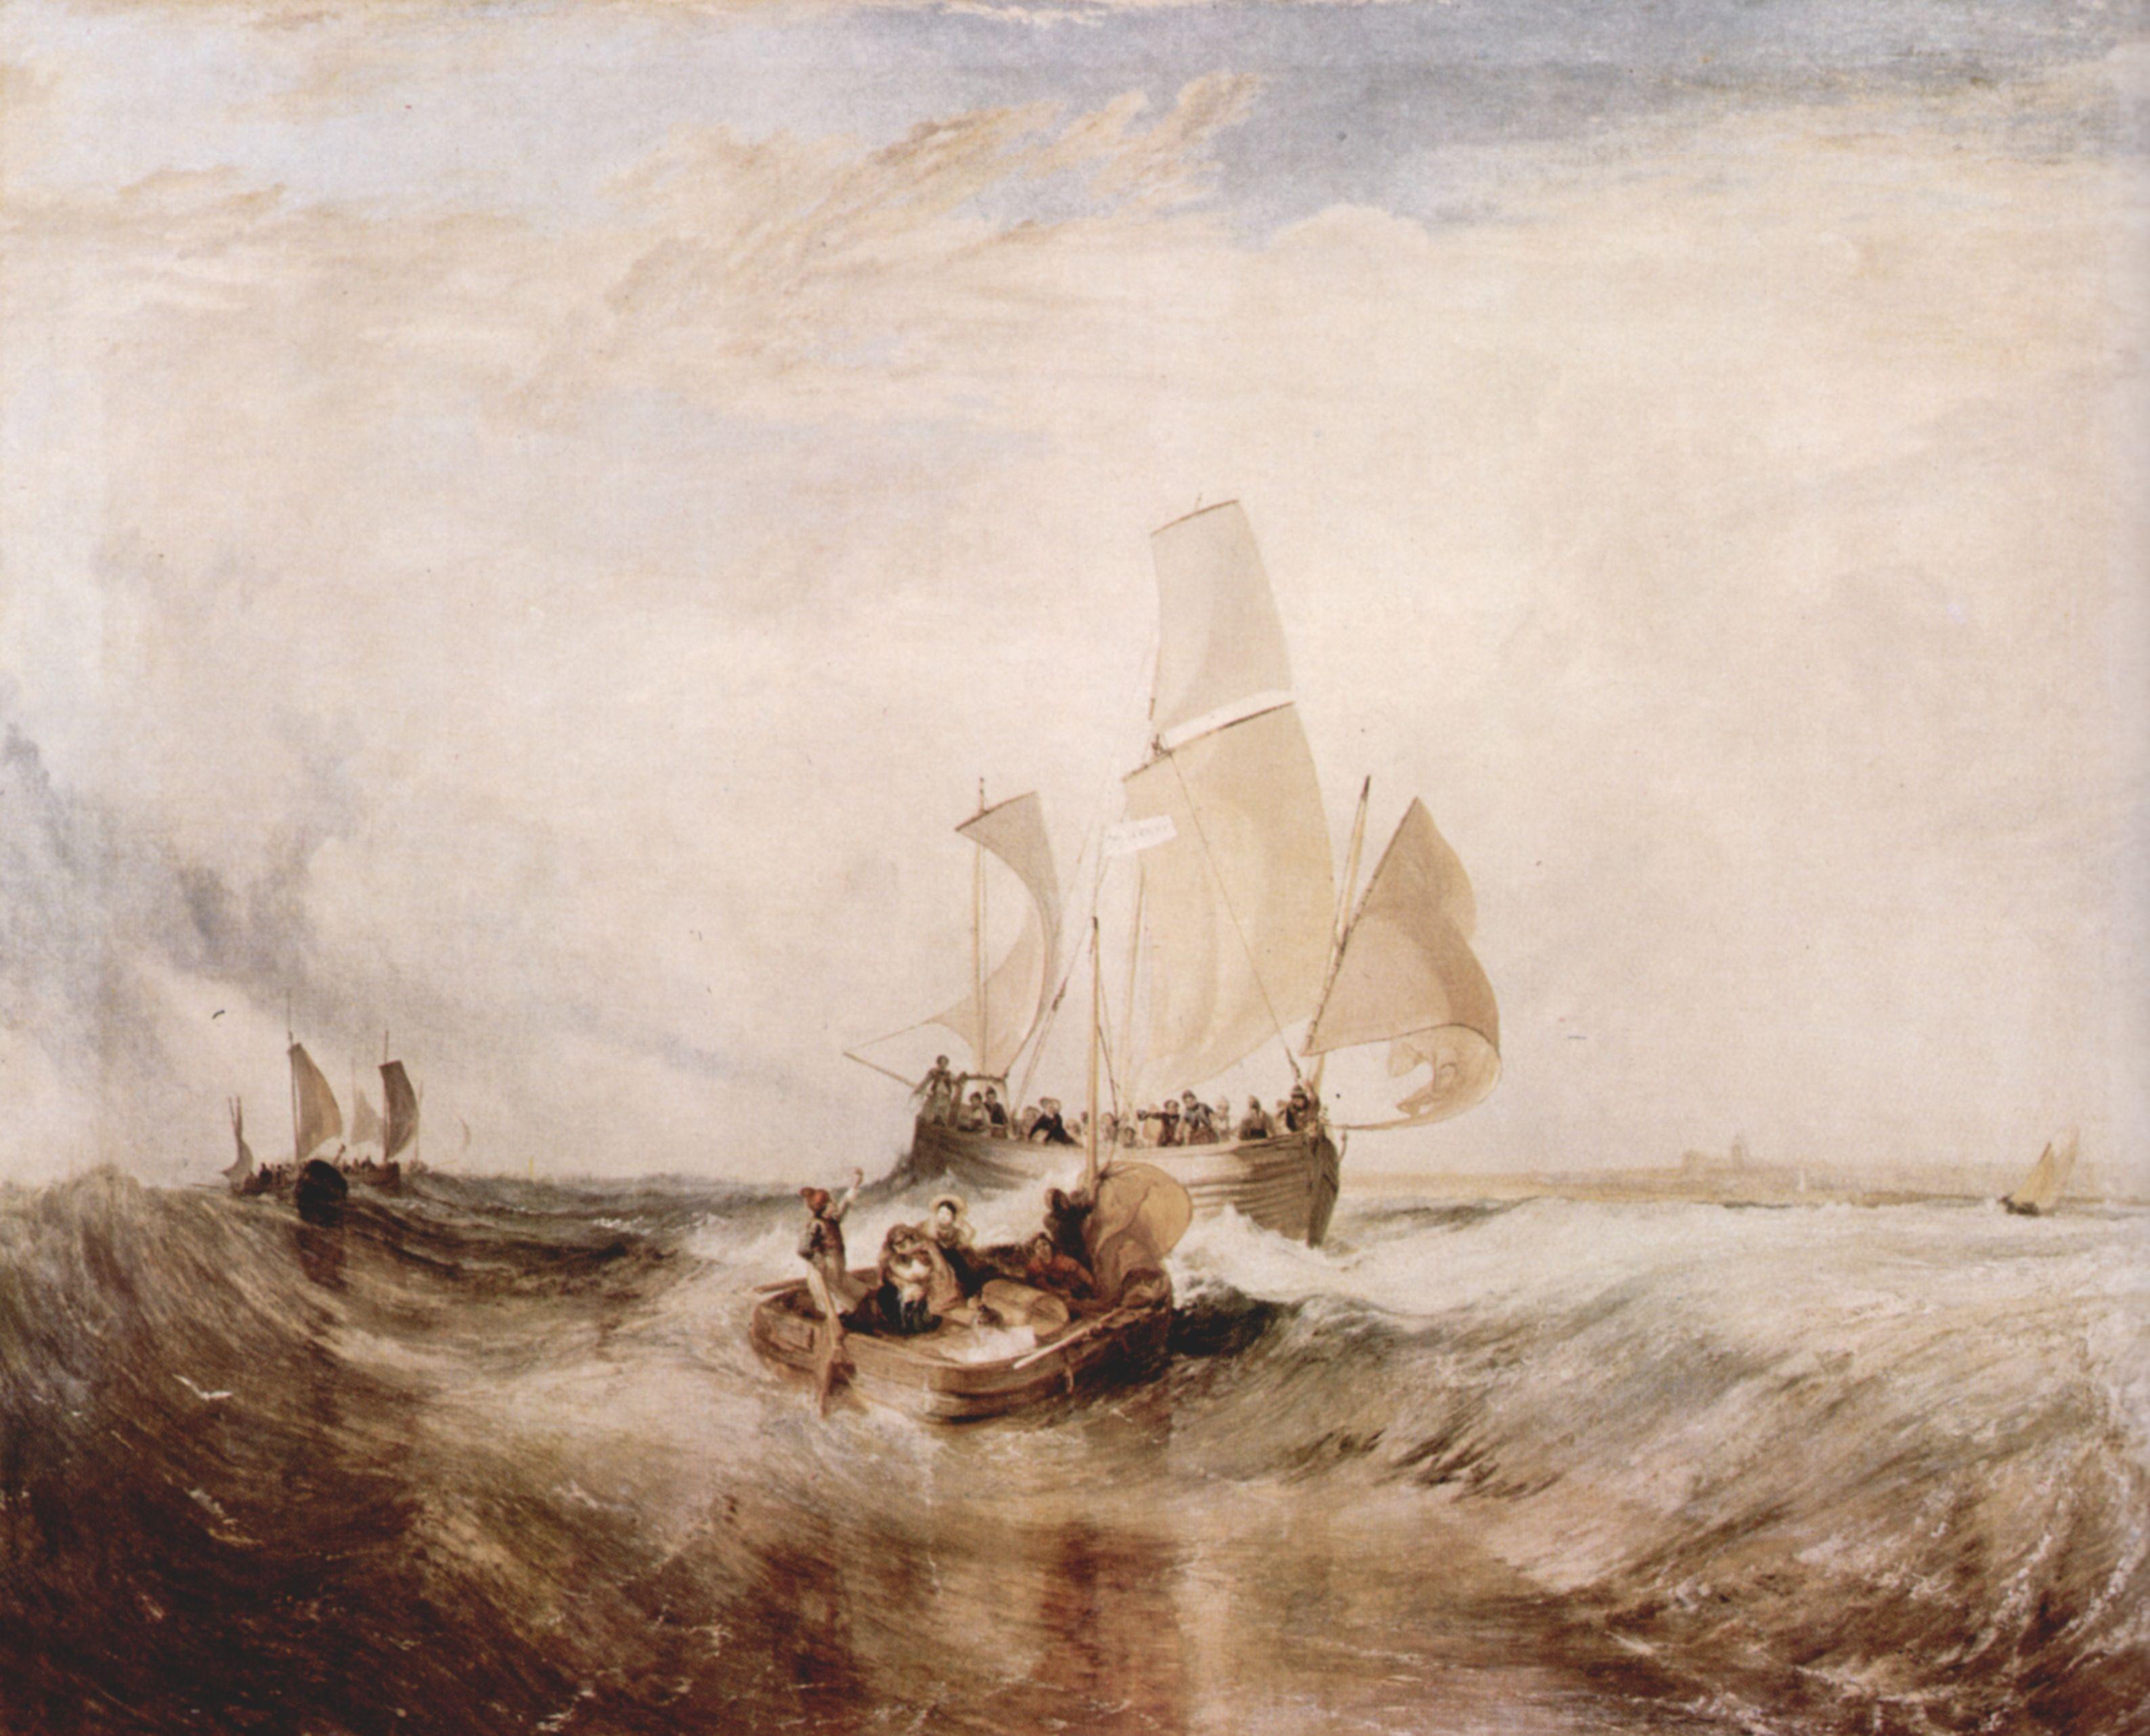 картина Пассажиры поднимаются на борт :: Уильям Тёрнер - William Turner фото